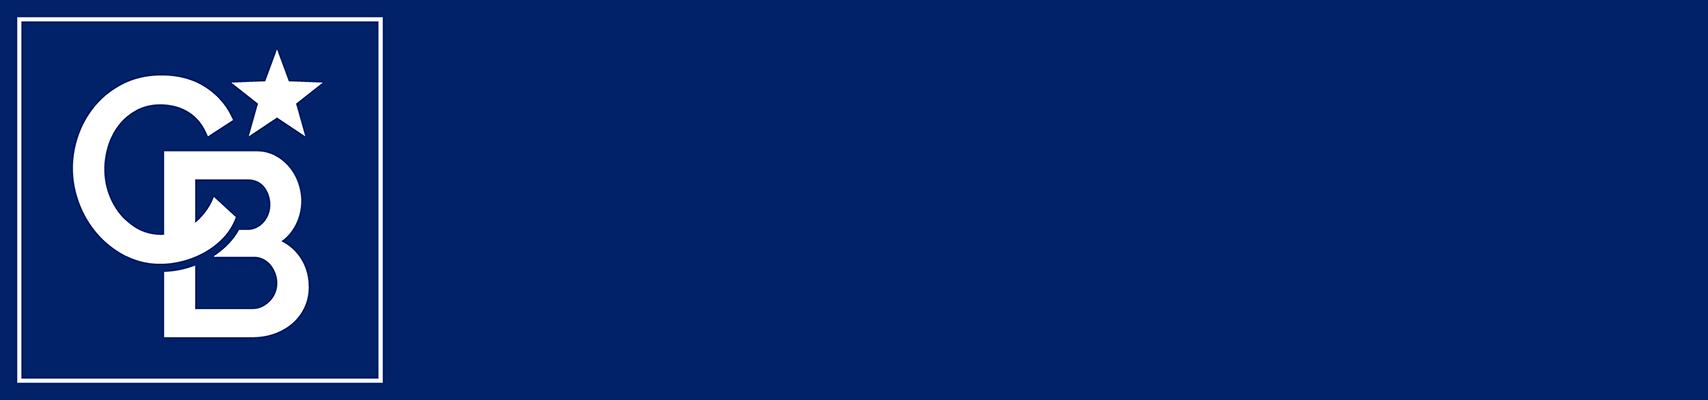 Maria Barcenas - Coldwell Banker Coastal Rivers Logo